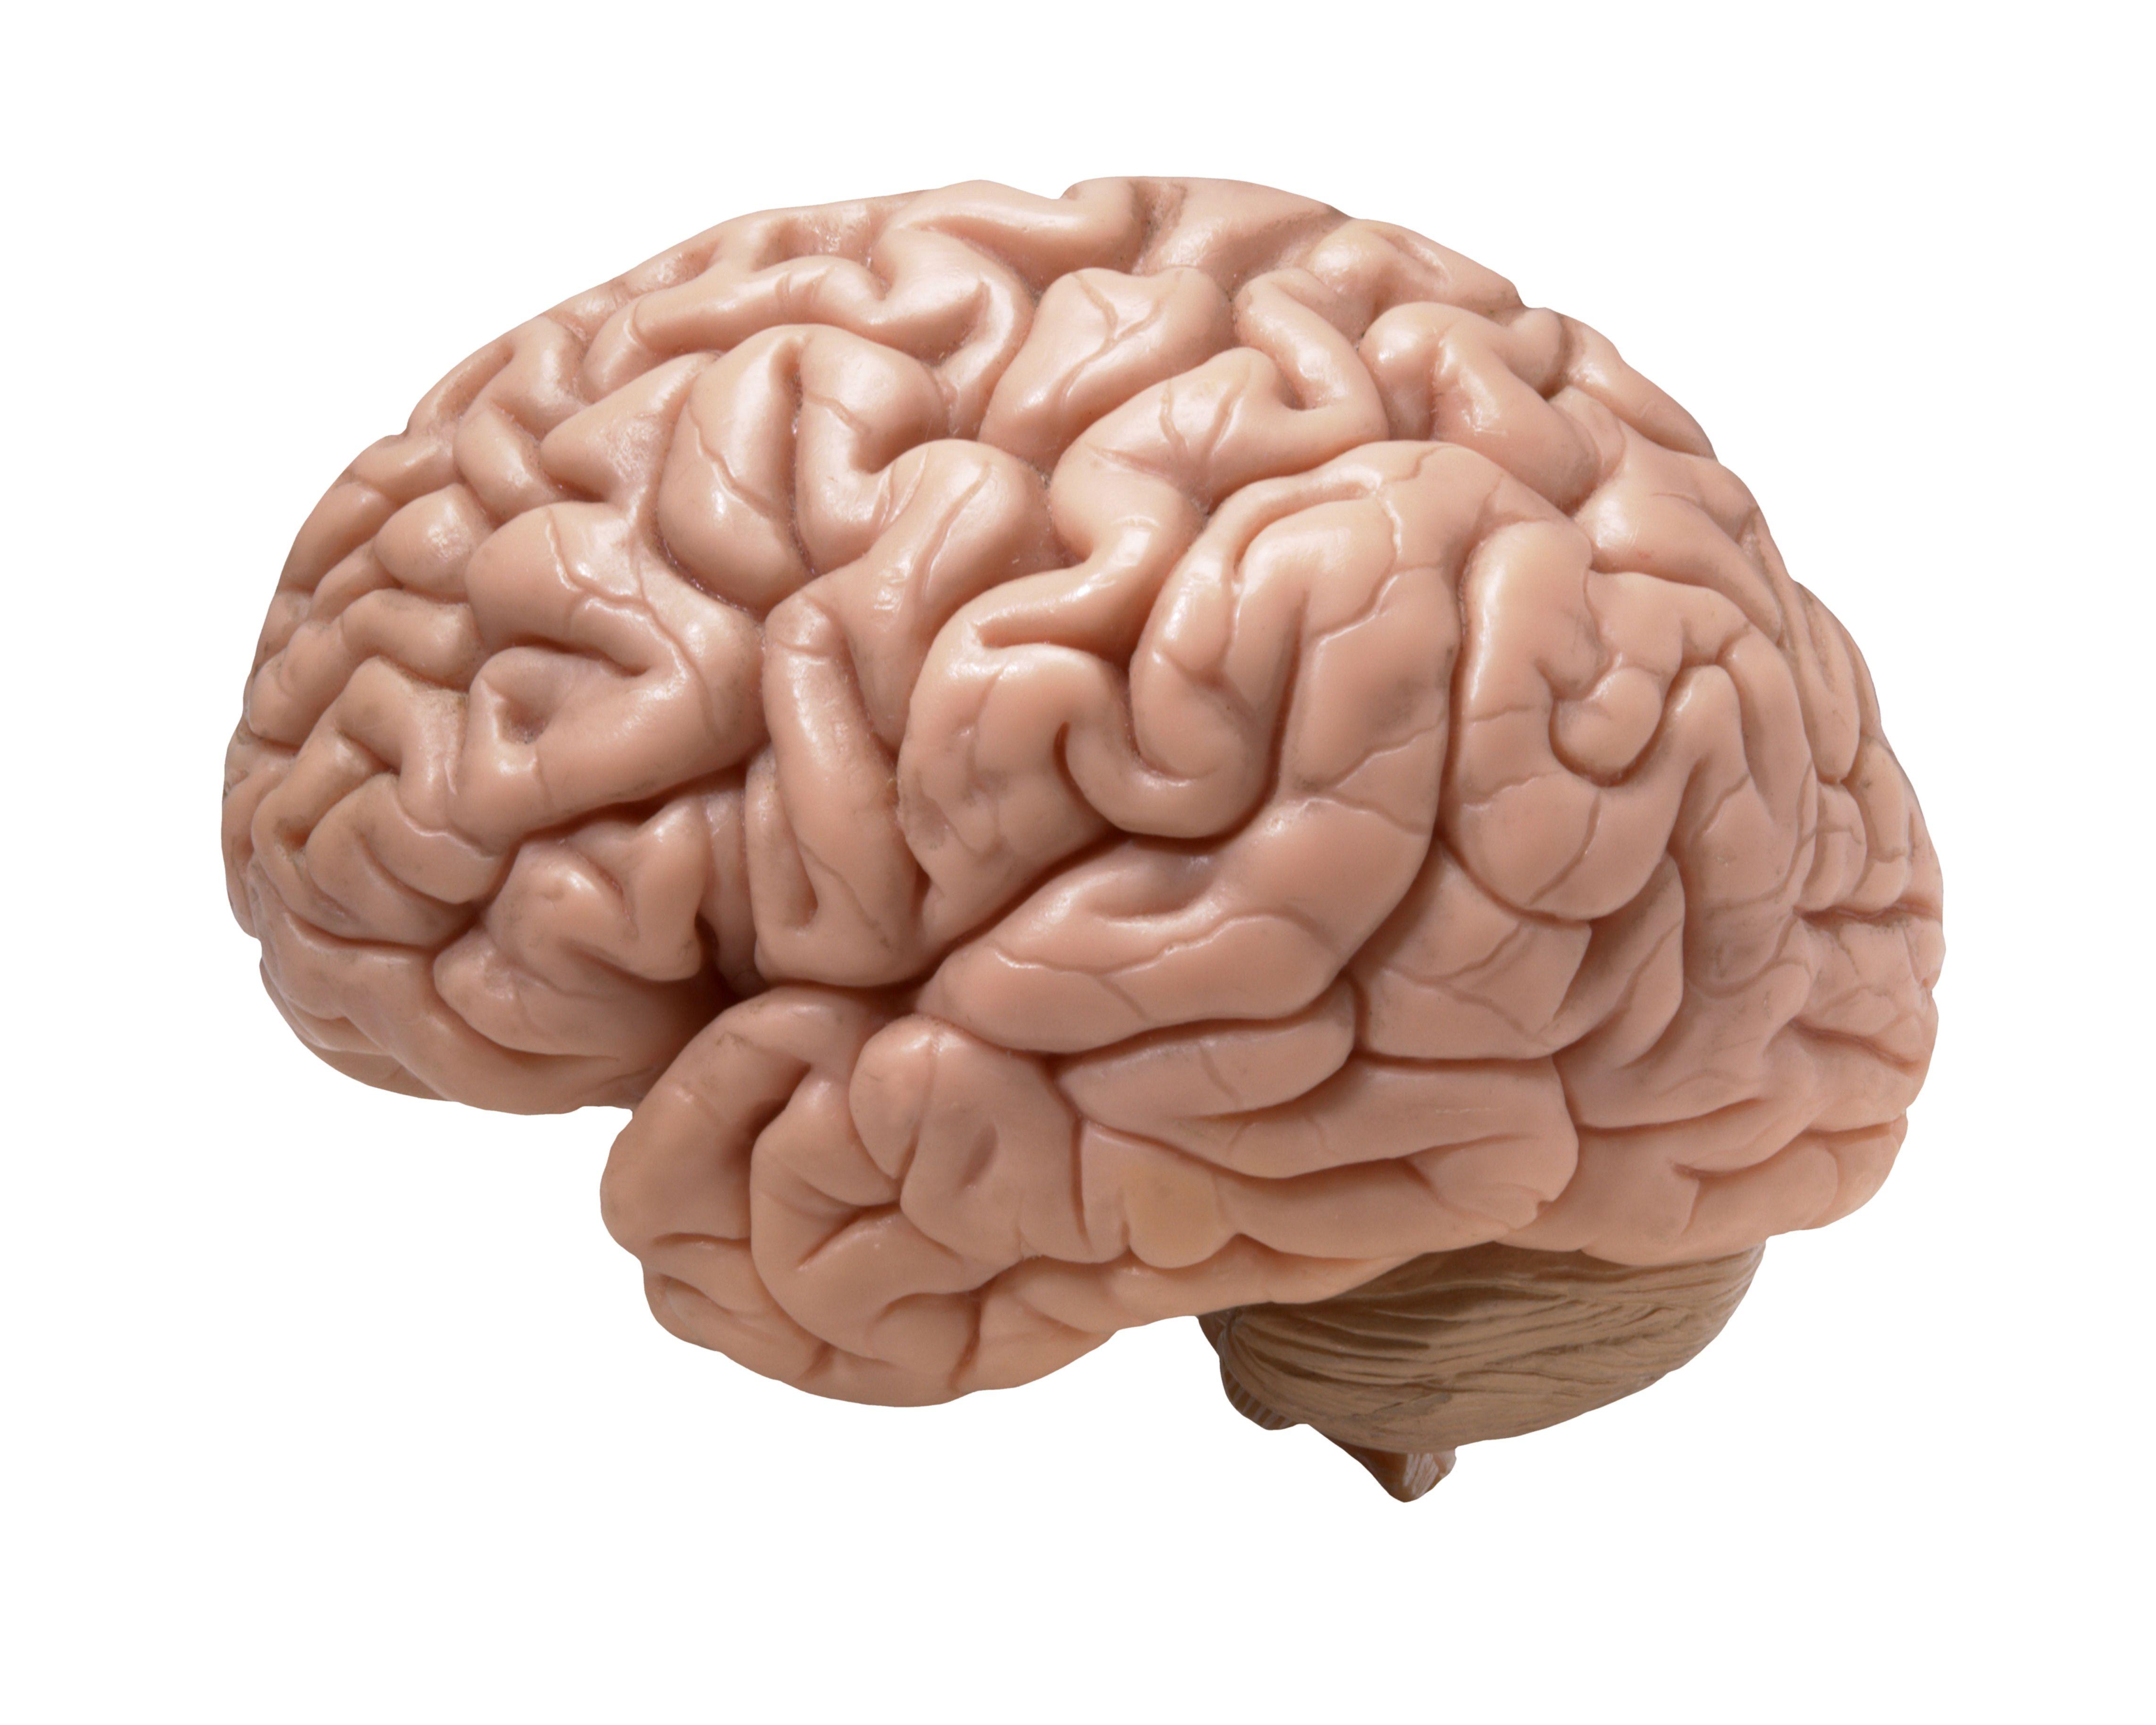 human brain on white background science brain, brain diseases